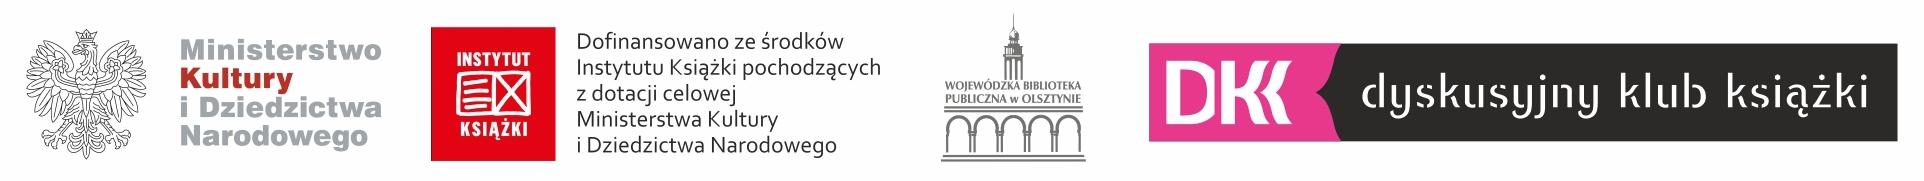 https://archiwum.wbp.olsztyn.pl/dkk/grafika/DKK_loga.jpg